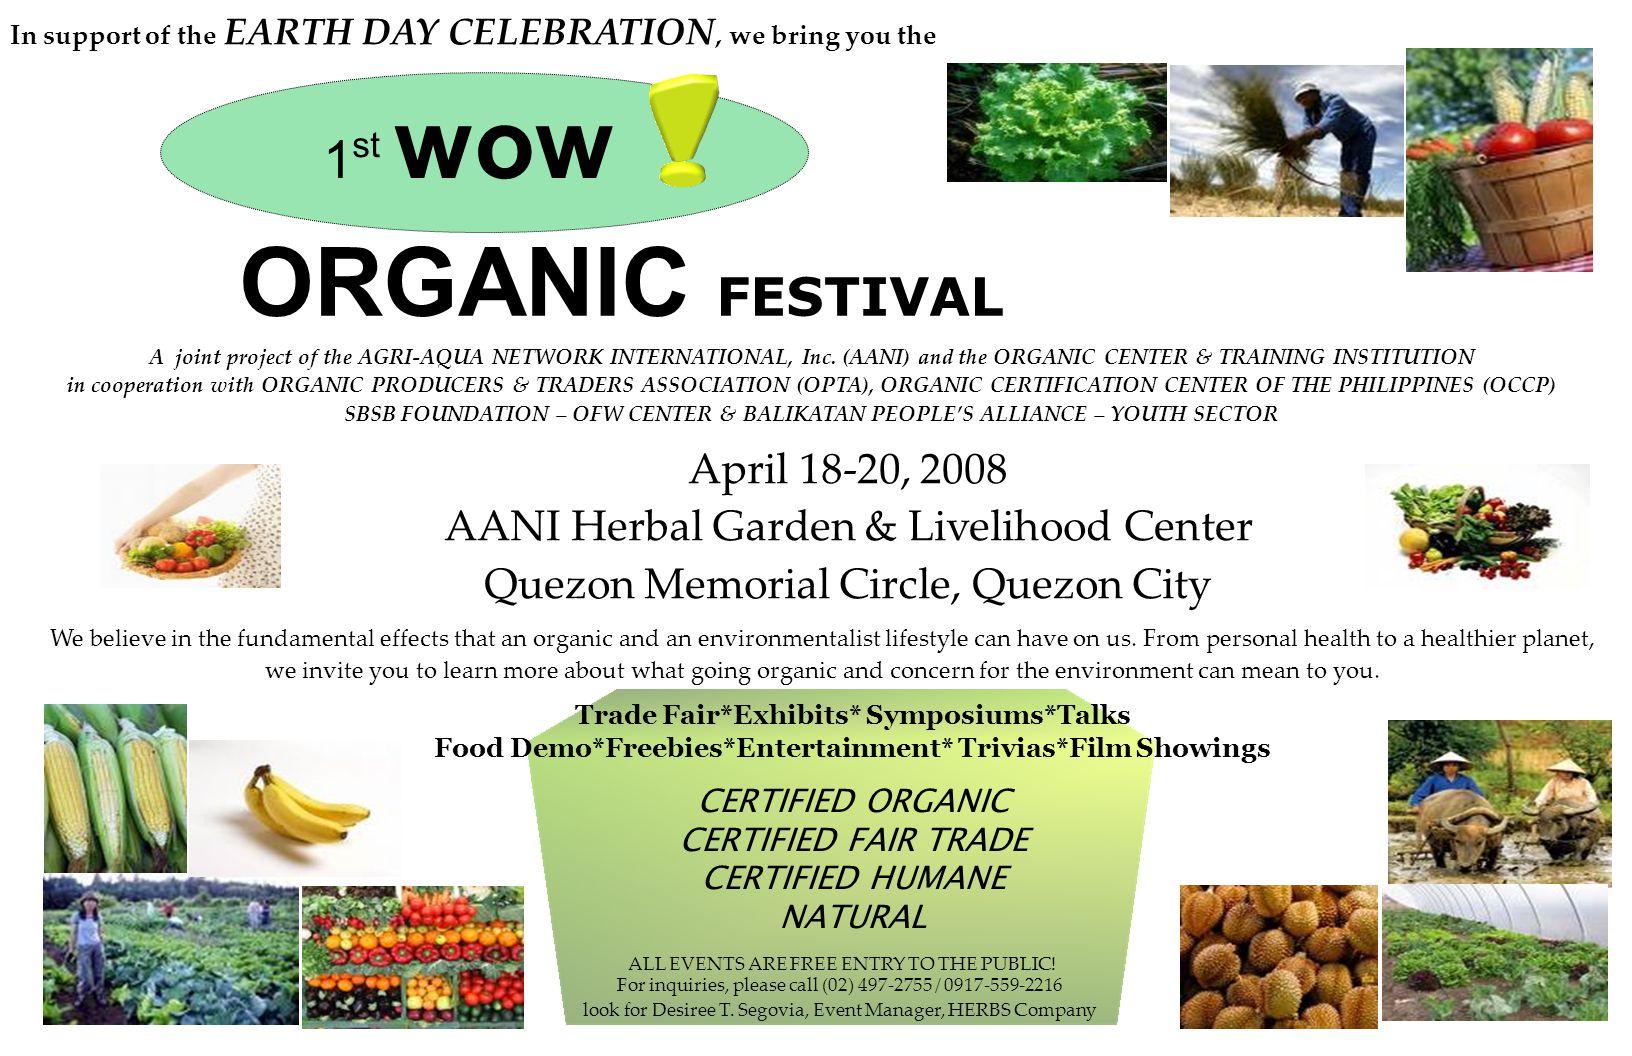 1 st wow ORGANIC FESTIVAL April 18-20, 2008 AANI Herbal Garden & Livelihood Center Quezon Memorial Circle, Quezon City We believe in the fundamental e